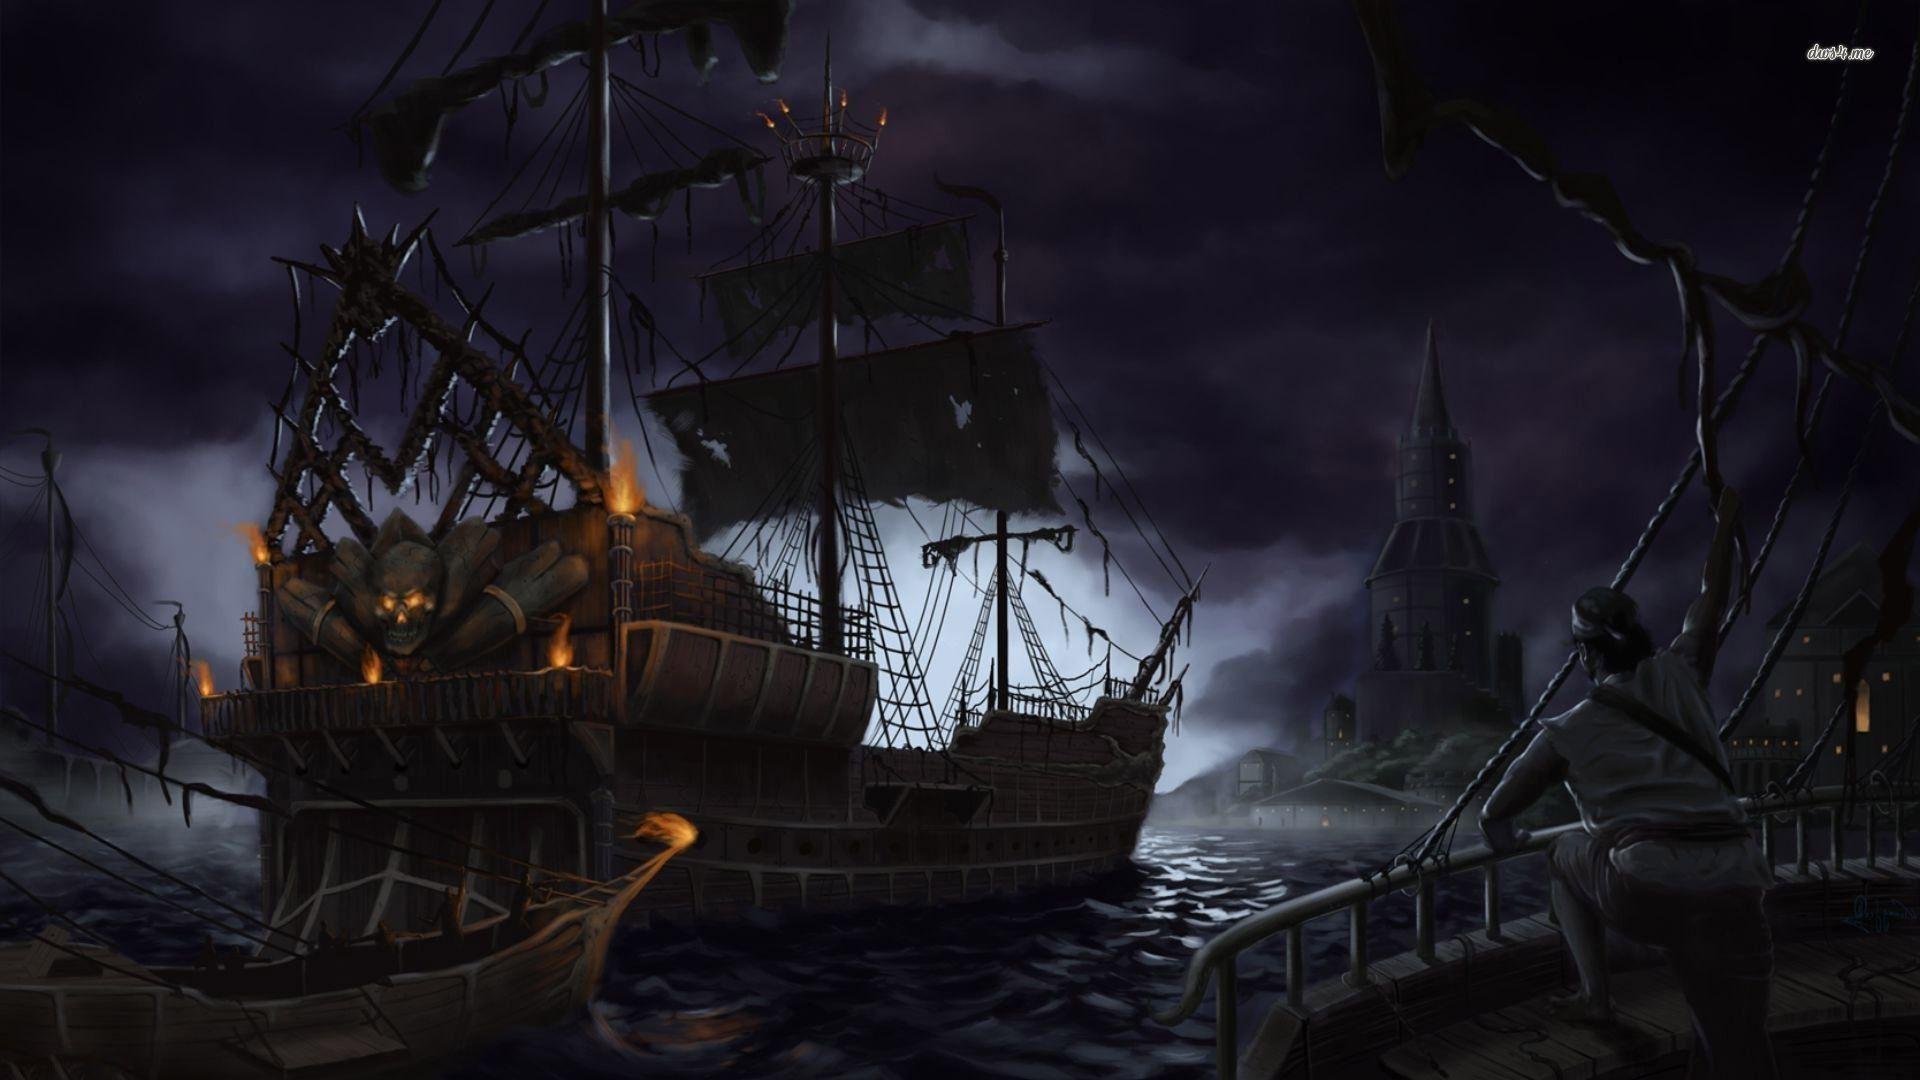 Old <b>Sailing Ships Wallpaper</b> – WallpaperSafari